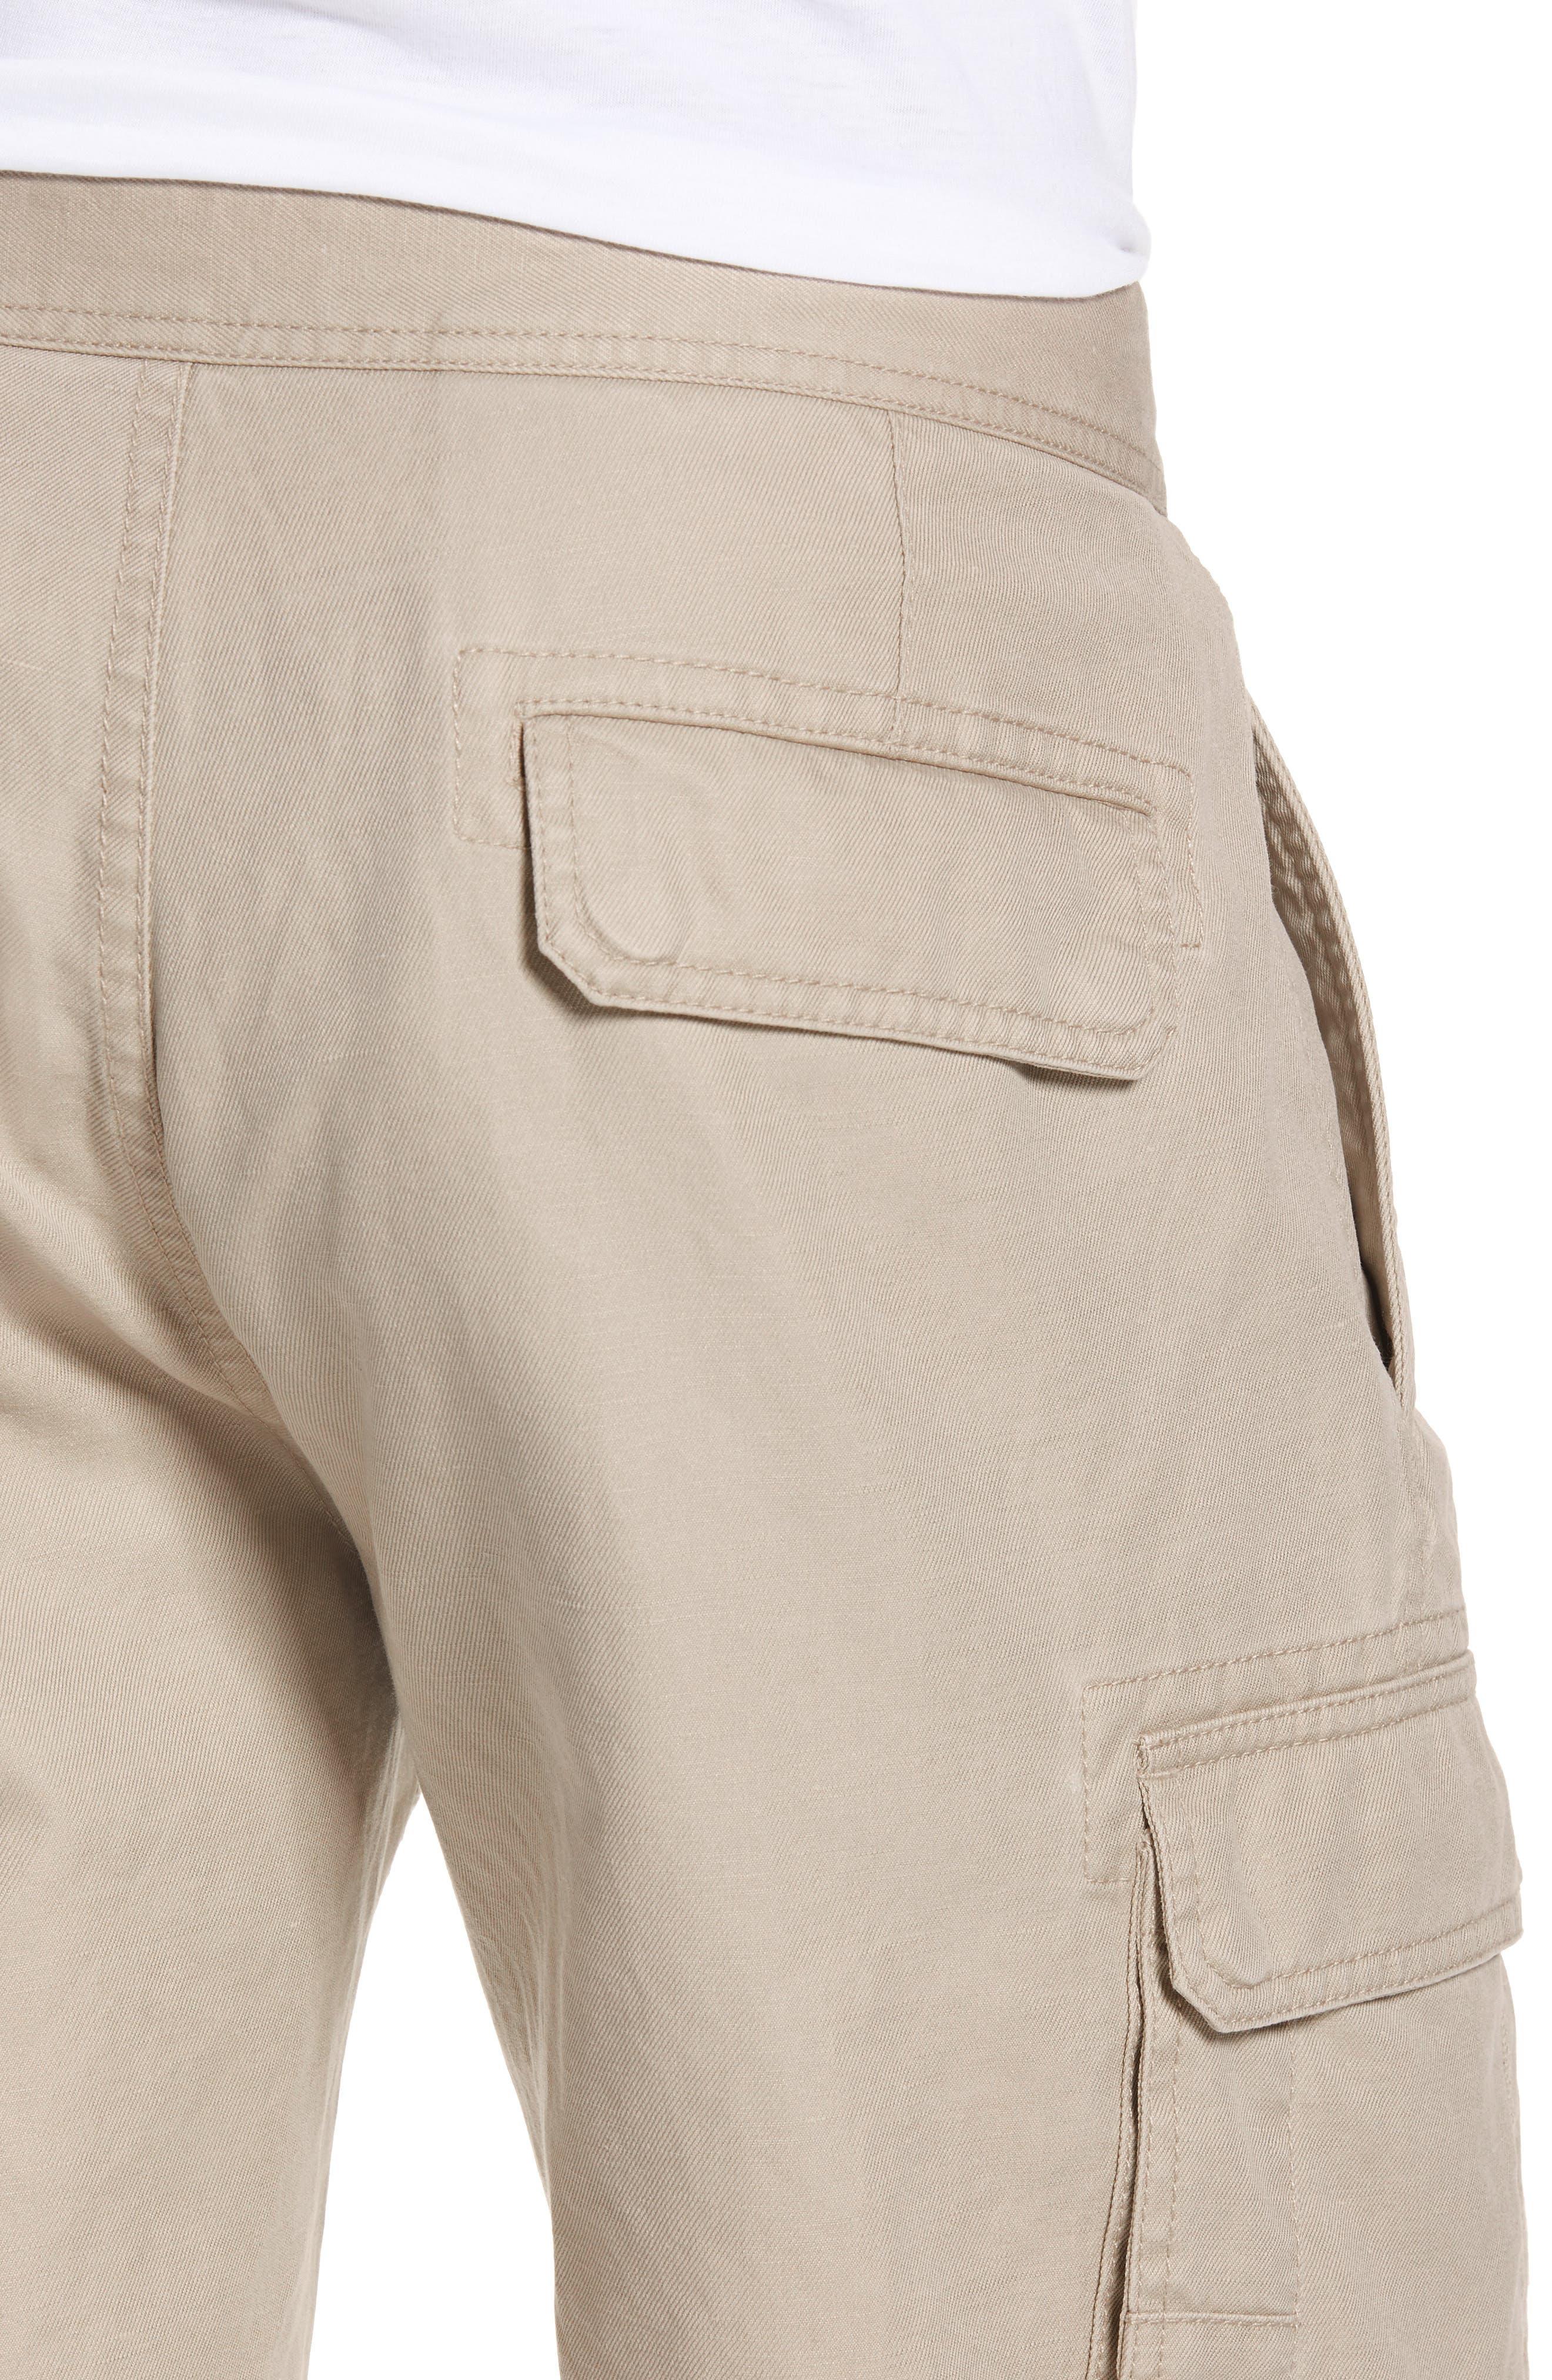 Sandyford Cargo Shorts,                             Alternate thumbnail 4, color,                             NATURAL